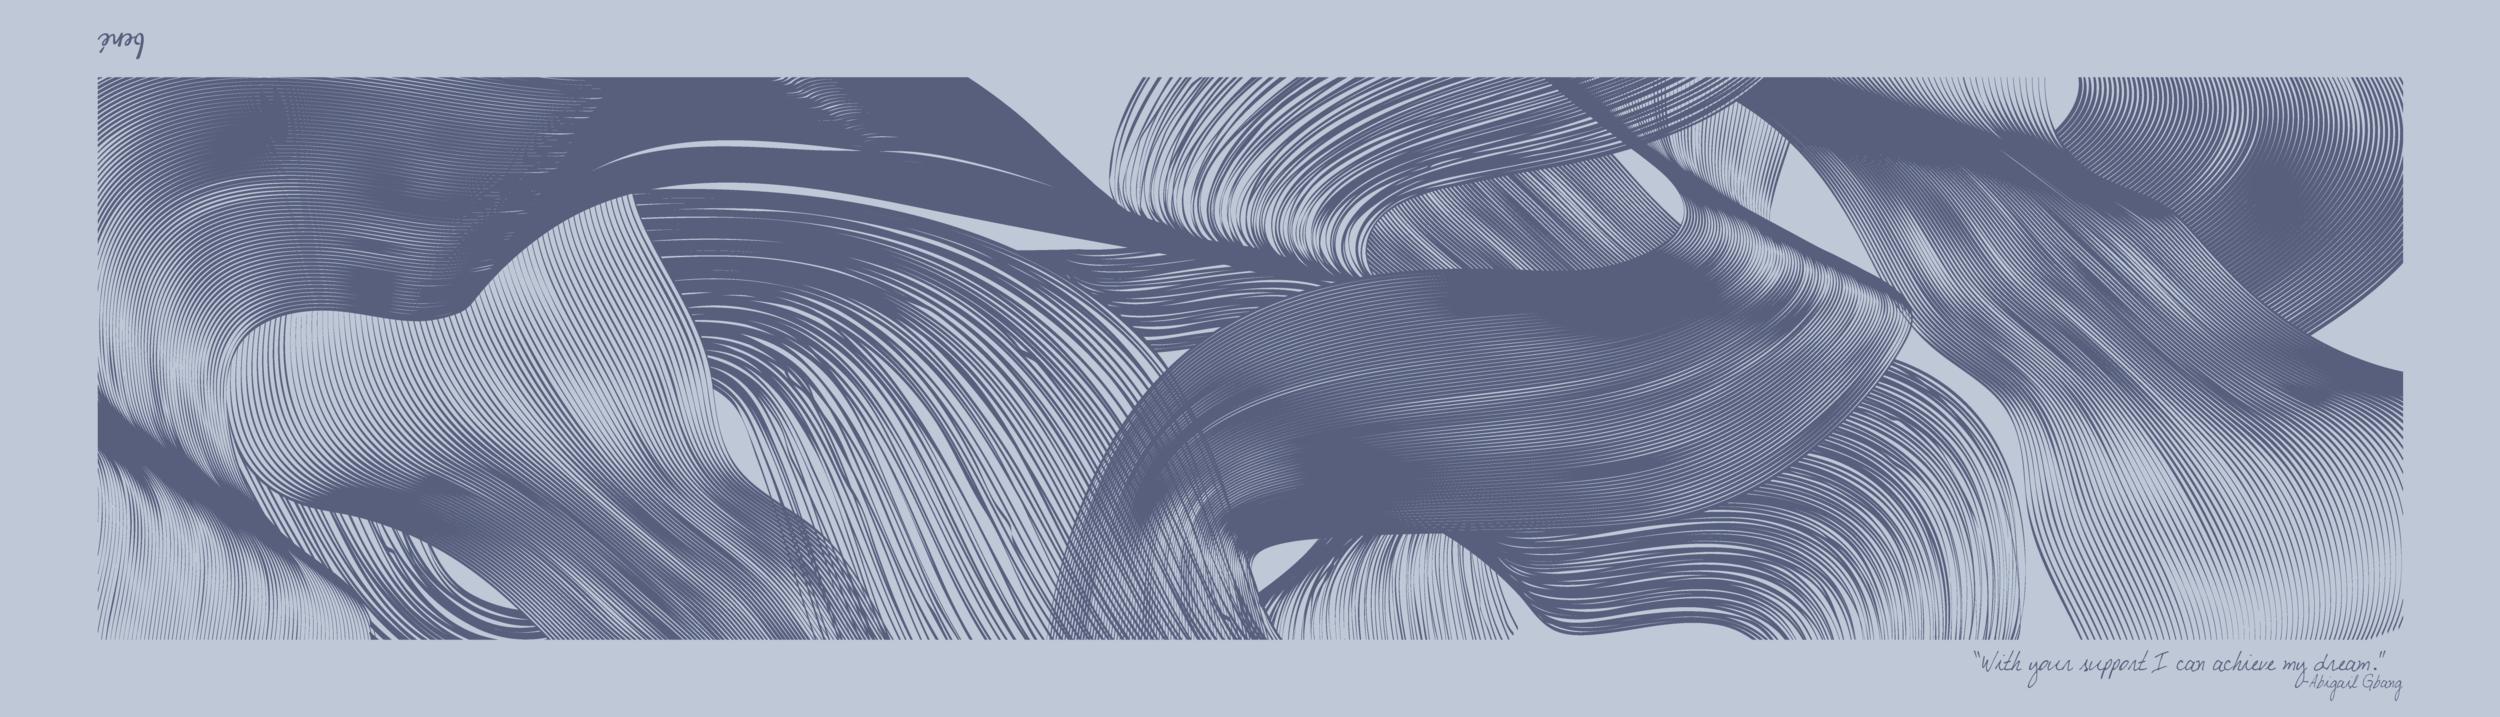 bene-forpotfoilio-wavesscarf-01.png